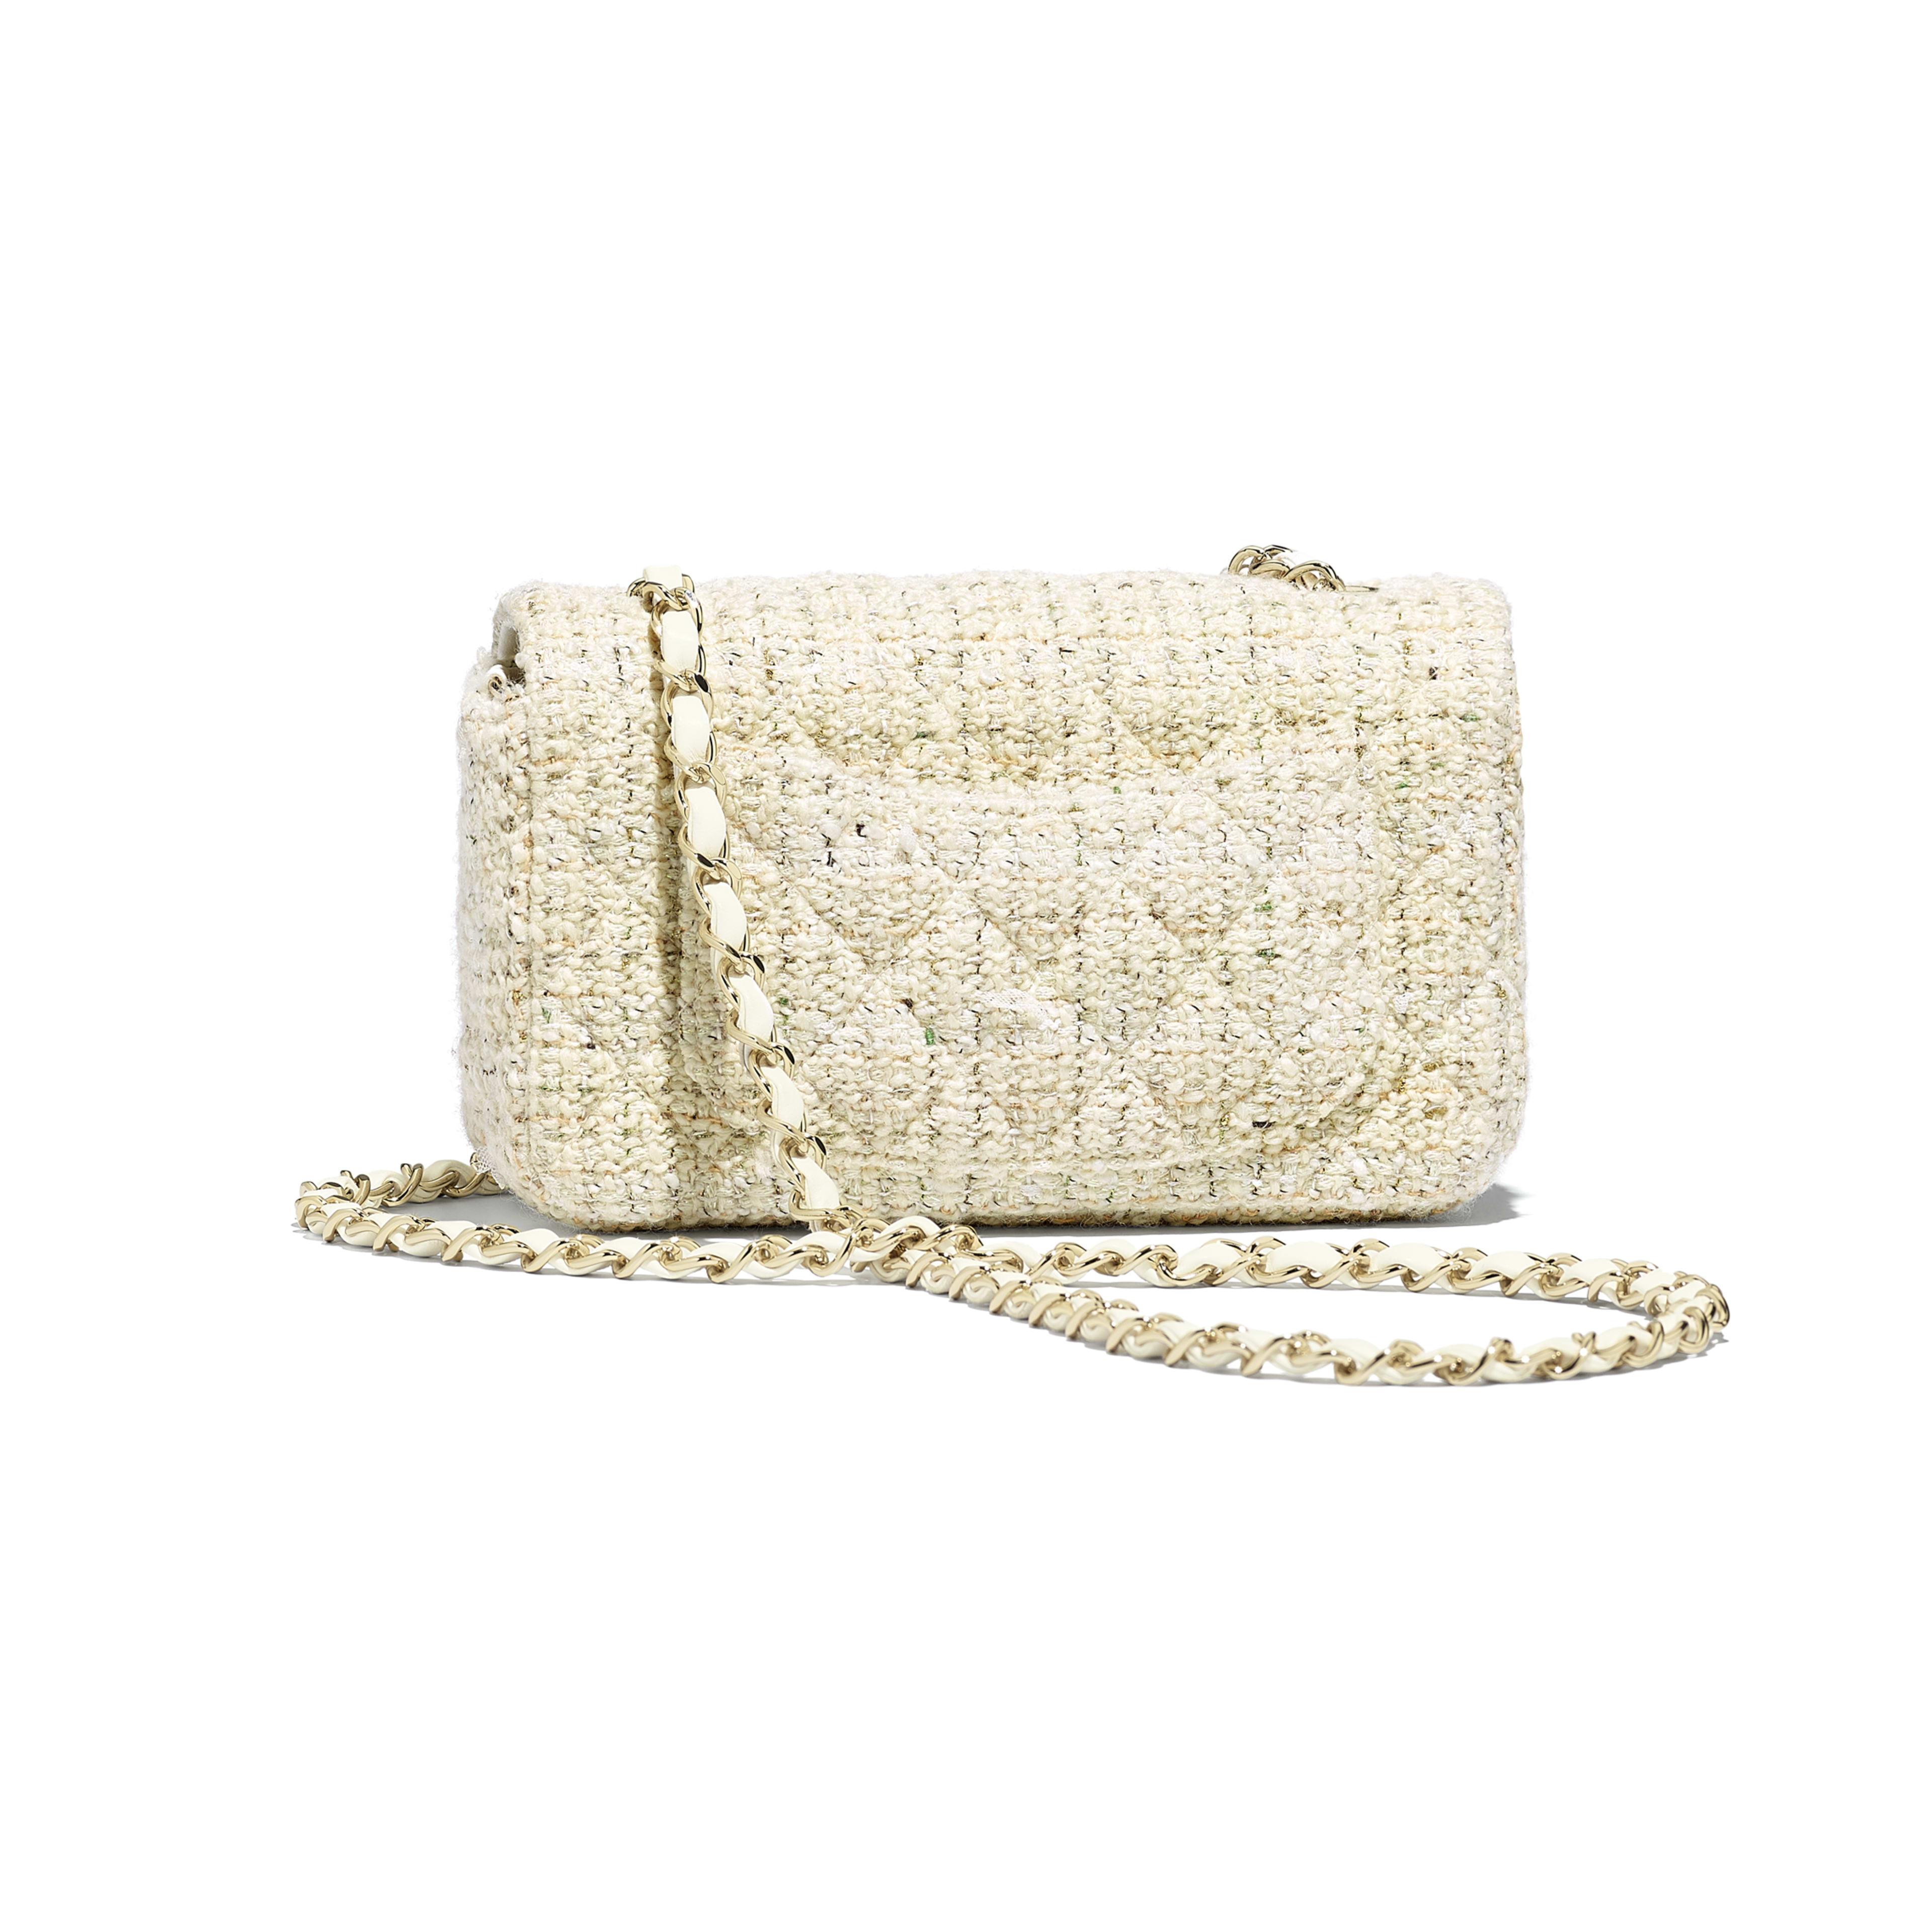 Mini Flap Bag - Ecru, white, green & gold - Tweed & Gold-Tone Metal - Alternative view - see full sized version